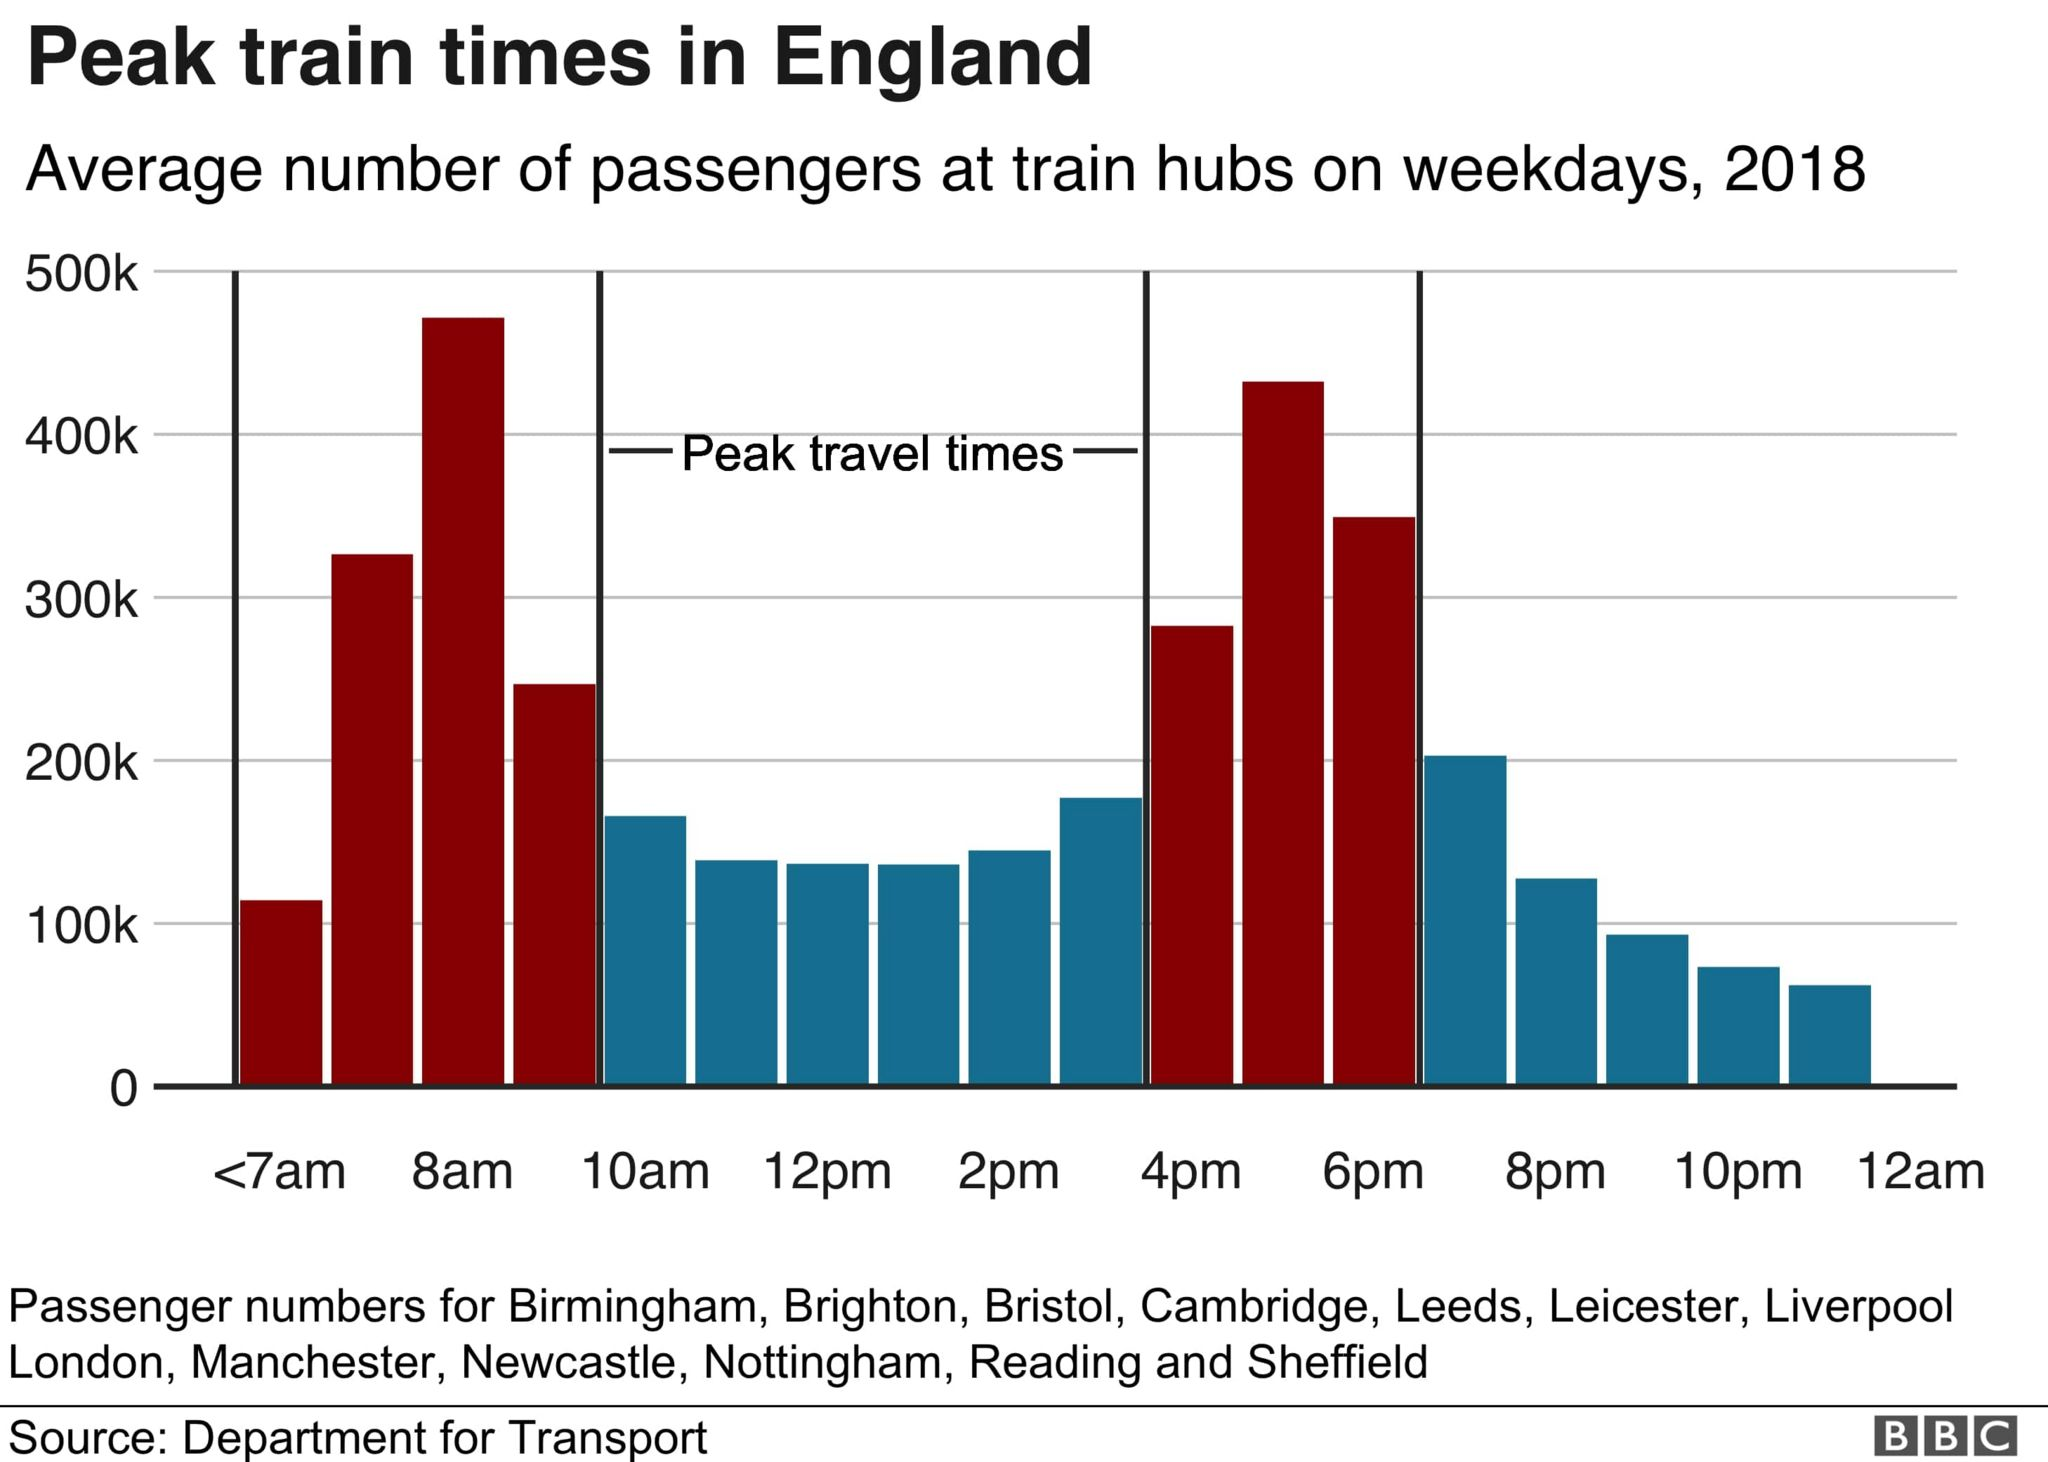 Peak trains in England